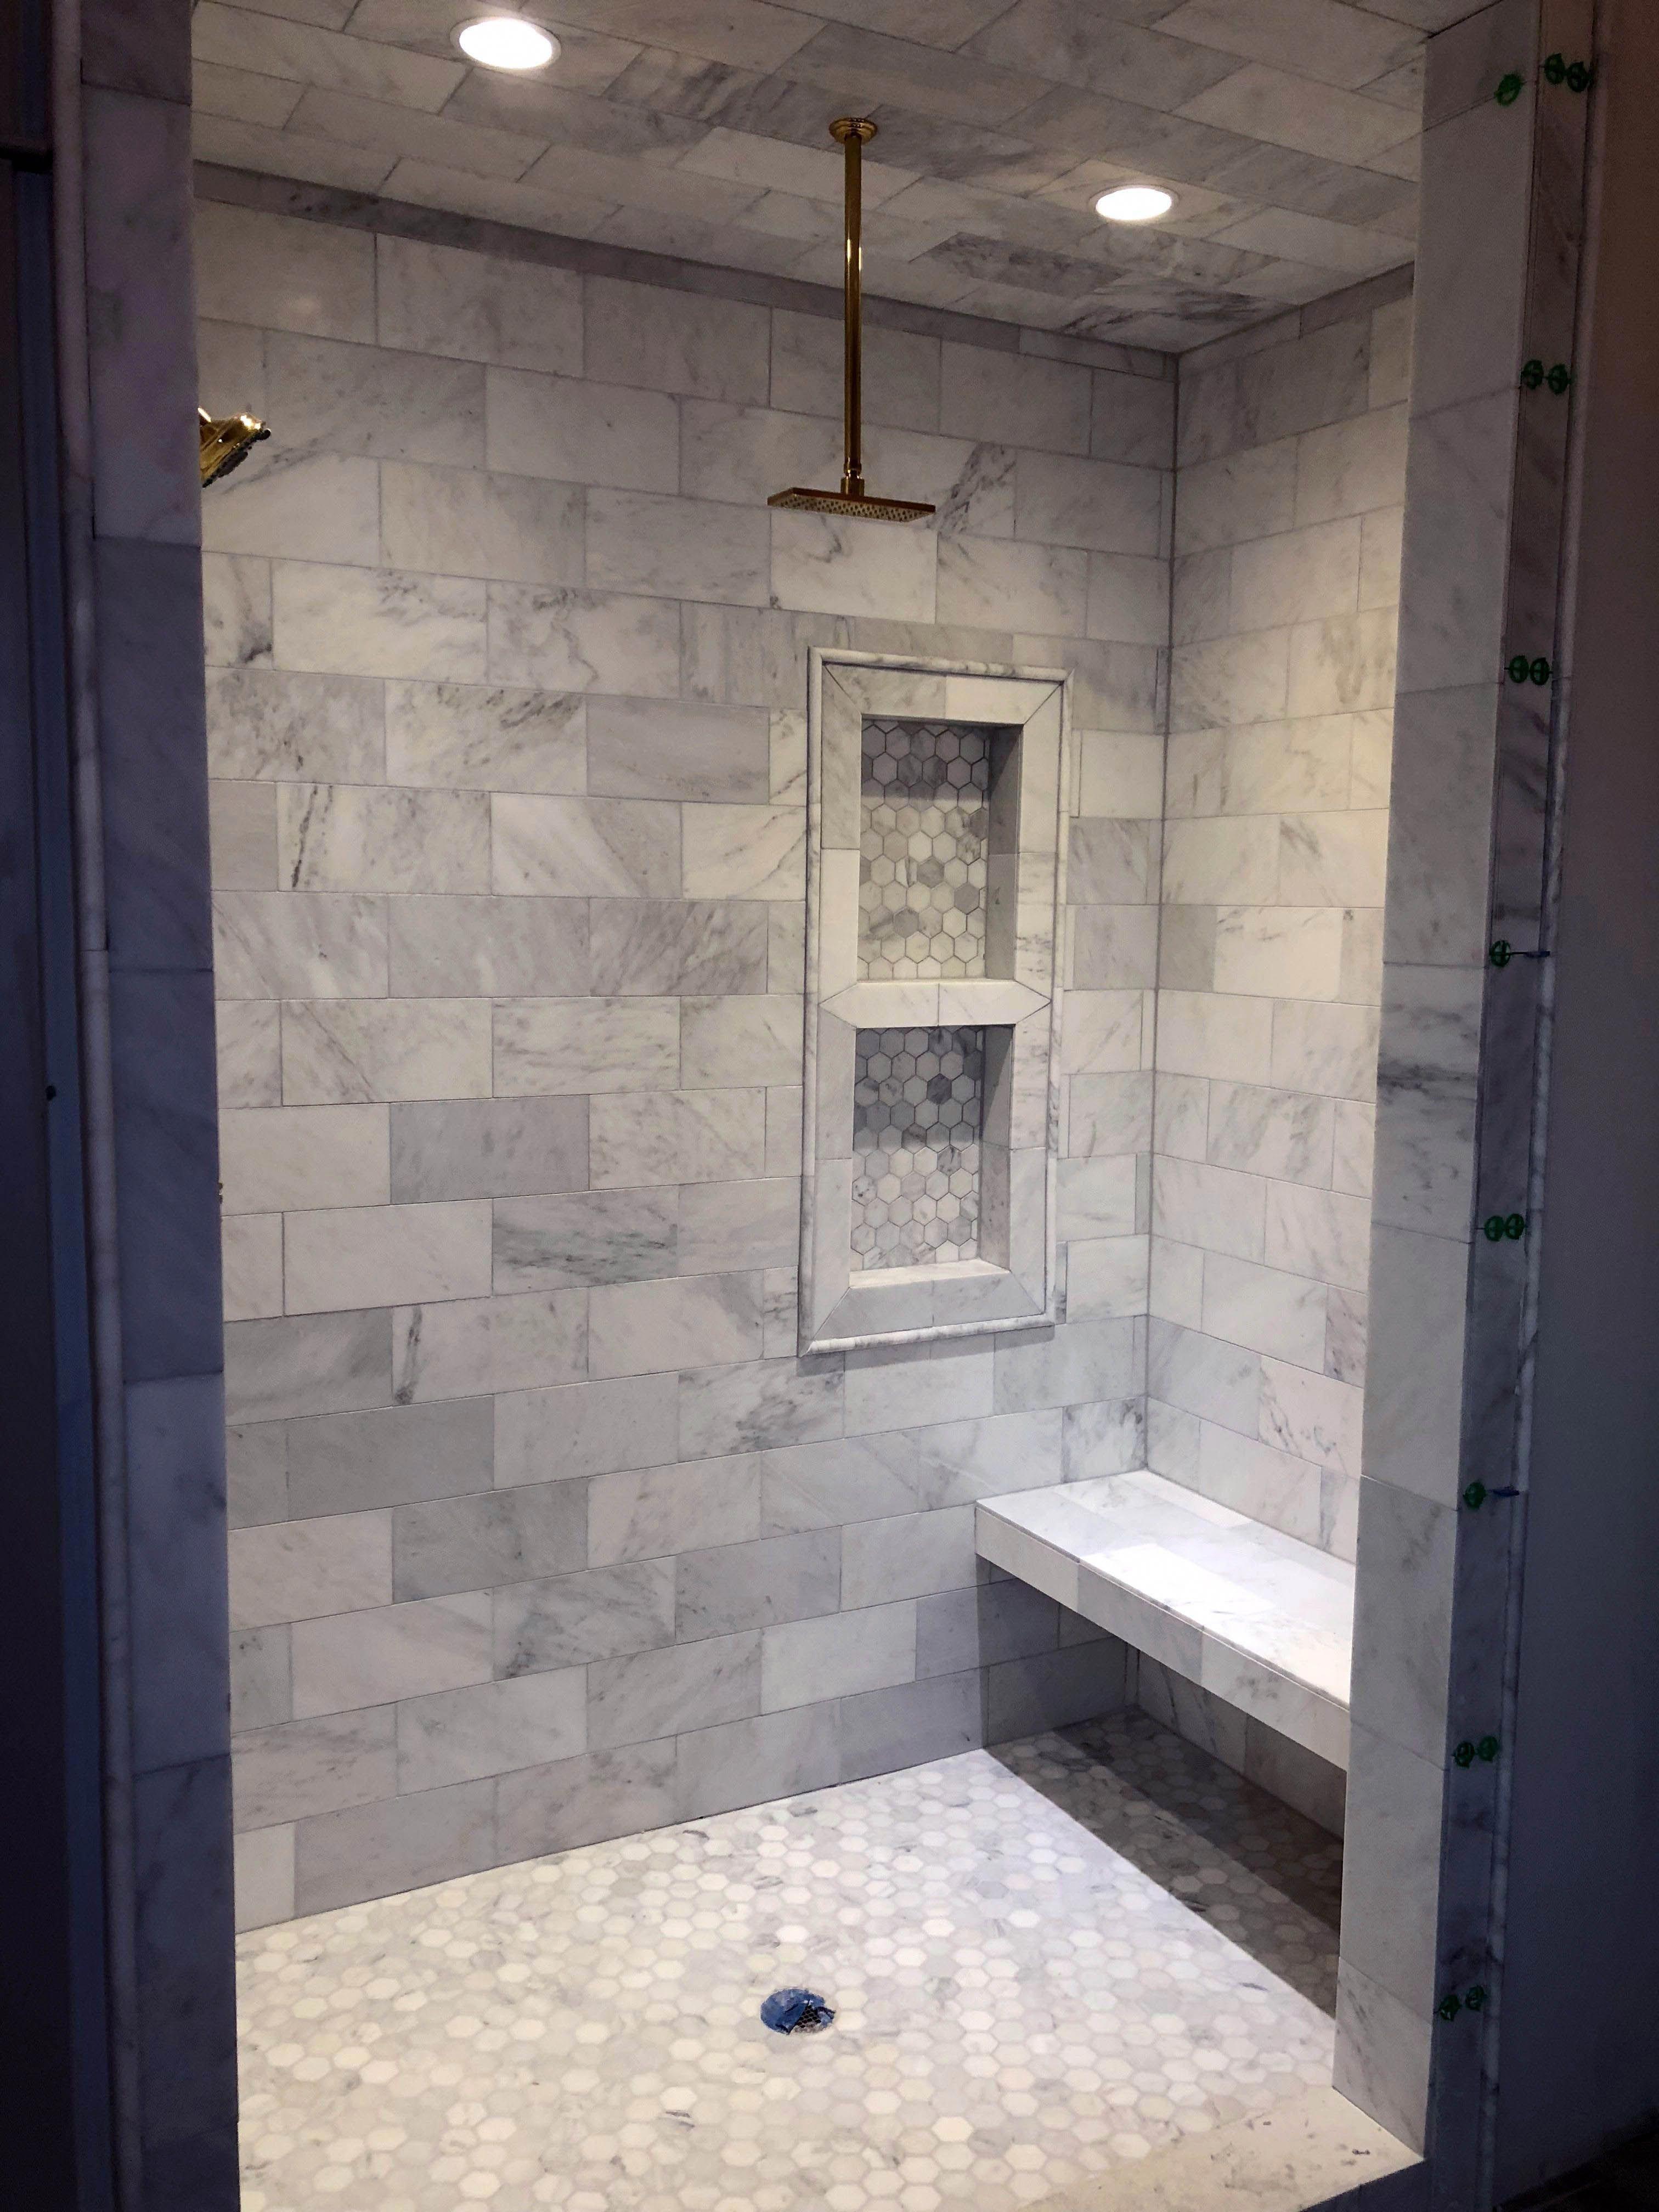 Bathroom Colors Tiles Smallbathroomikea Code 7655108266 Bathroom Remodel Shower Farmhouse Shower Bathroom Shower Tile